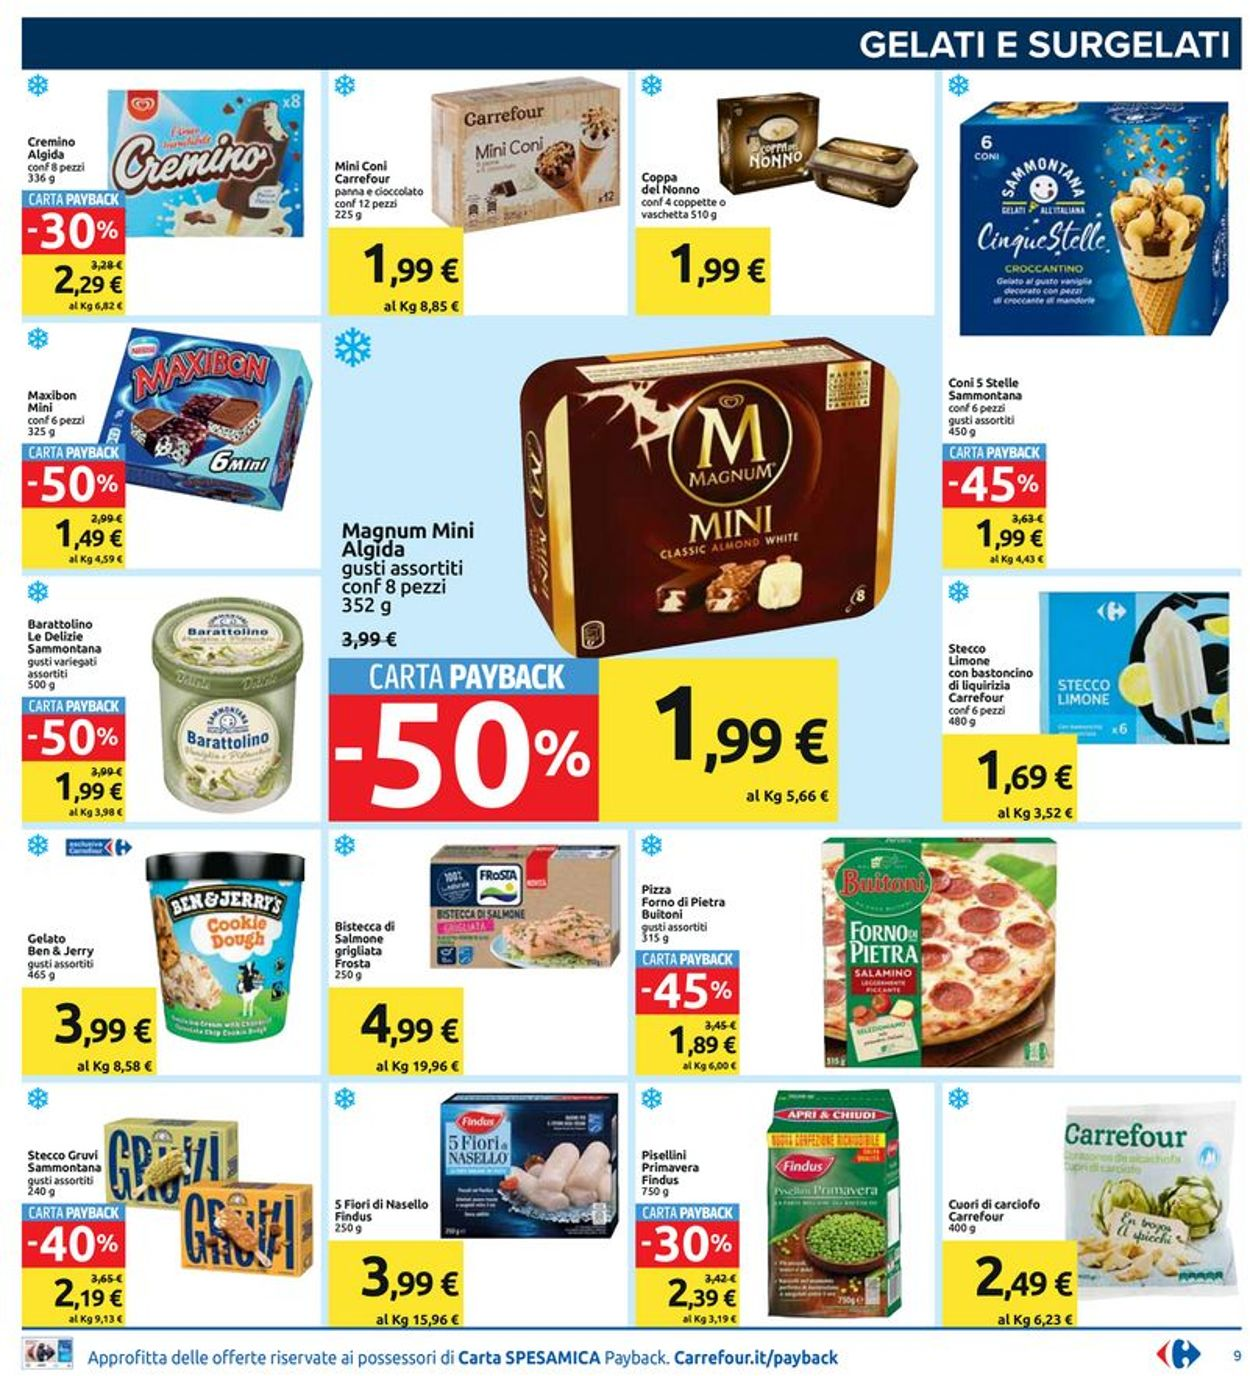 Volantino Carrefour - Offerte 28/07-06/08/2020 (Pagina 9)